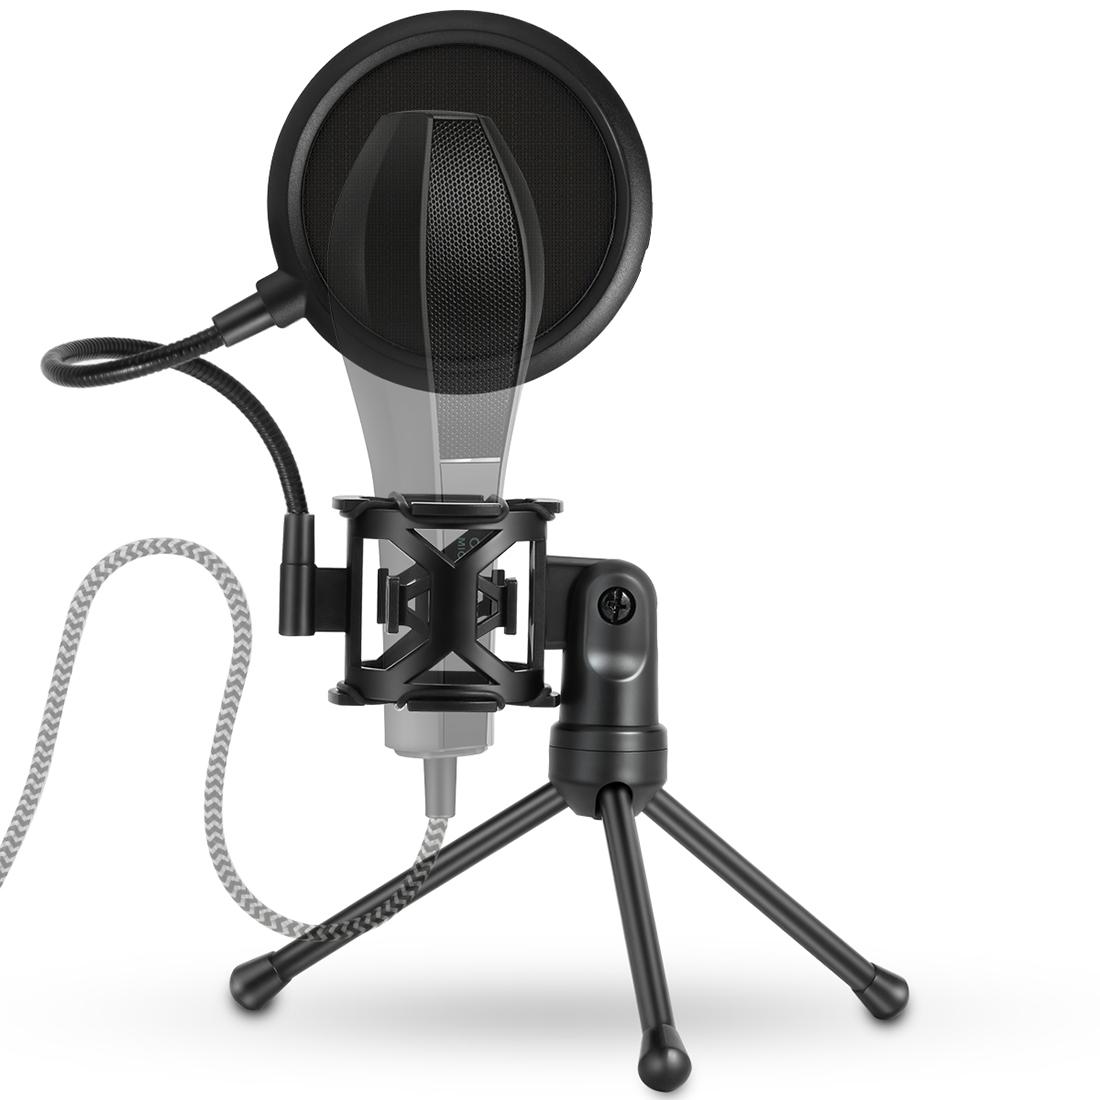 ... Microphone Studio Wind Screen Pop Filter Mic Mask Shield, For. MCP6078B_1.jpg; MCP6078B.jpg; MCP6078B_2.jpg ...